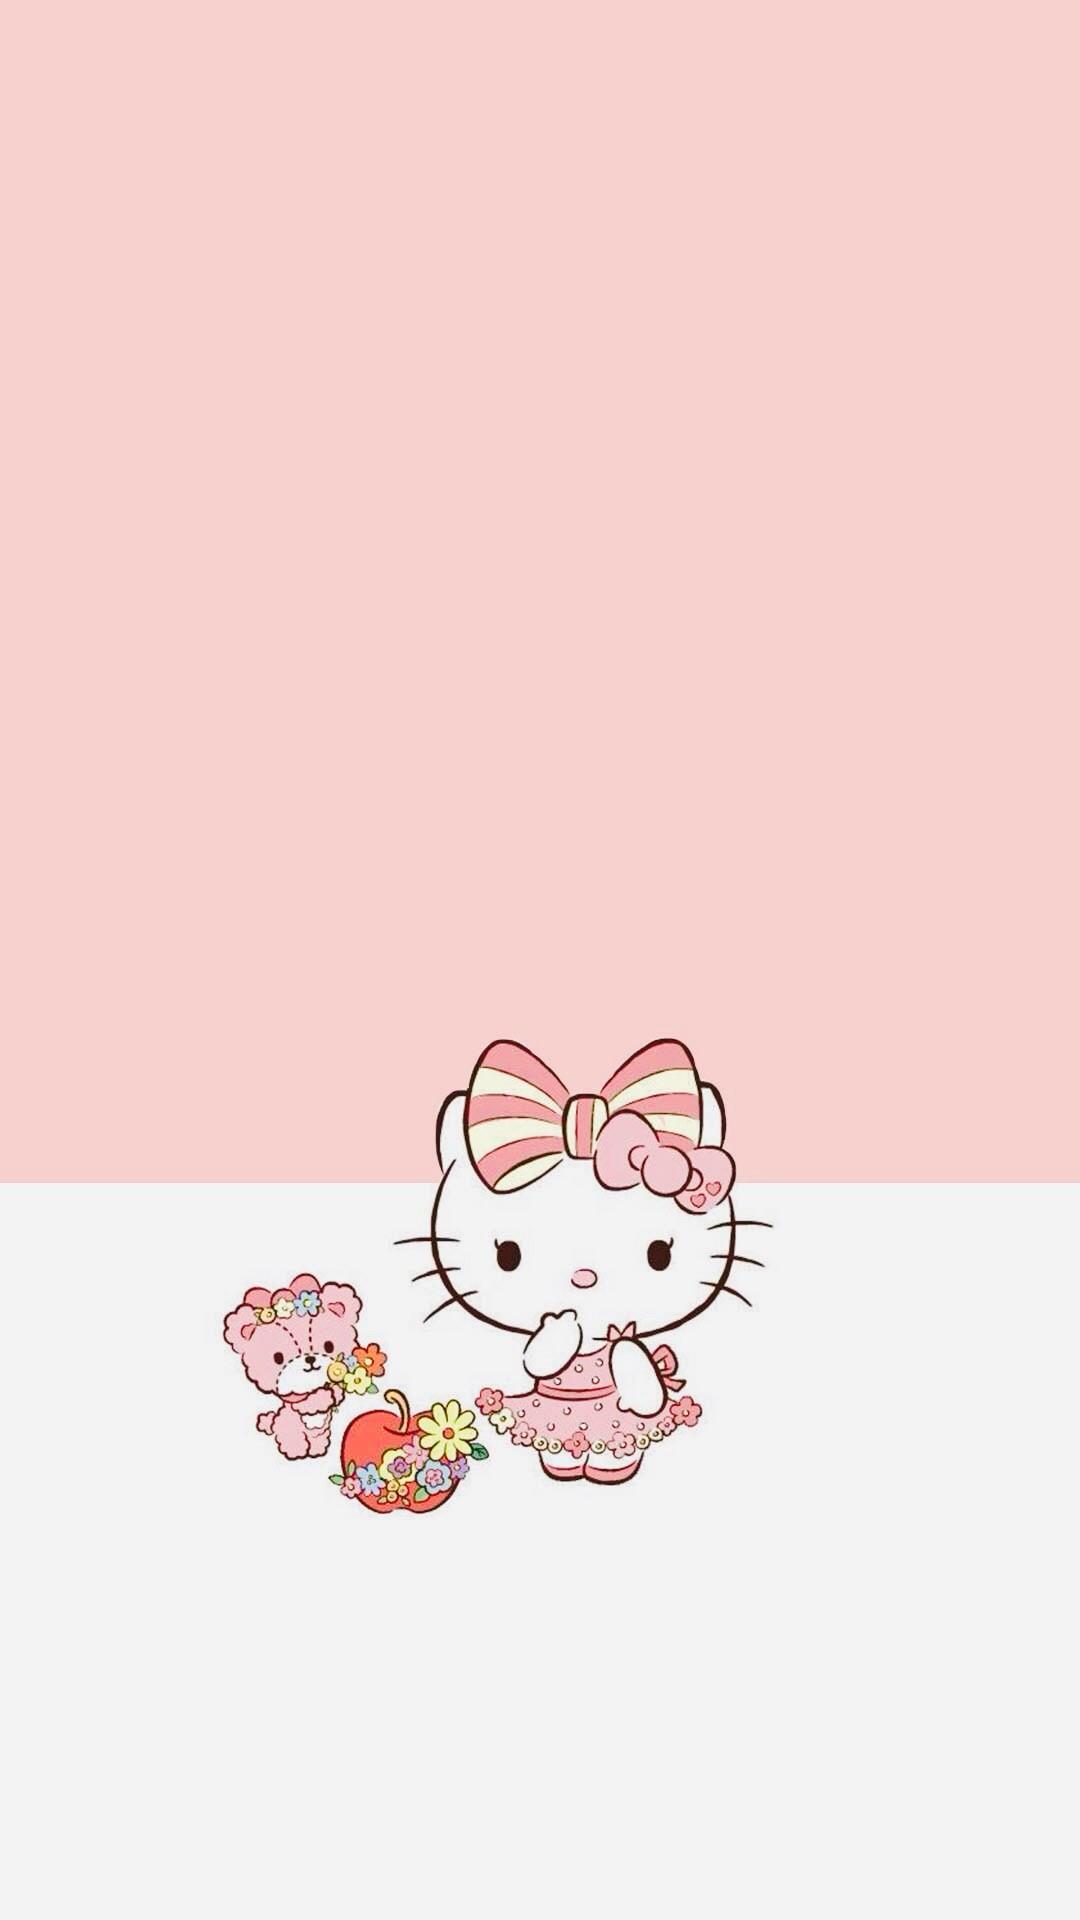 Great Wallpaper Hello Kitty Iphone 6 - 364385  Snapshot_444583.jpg